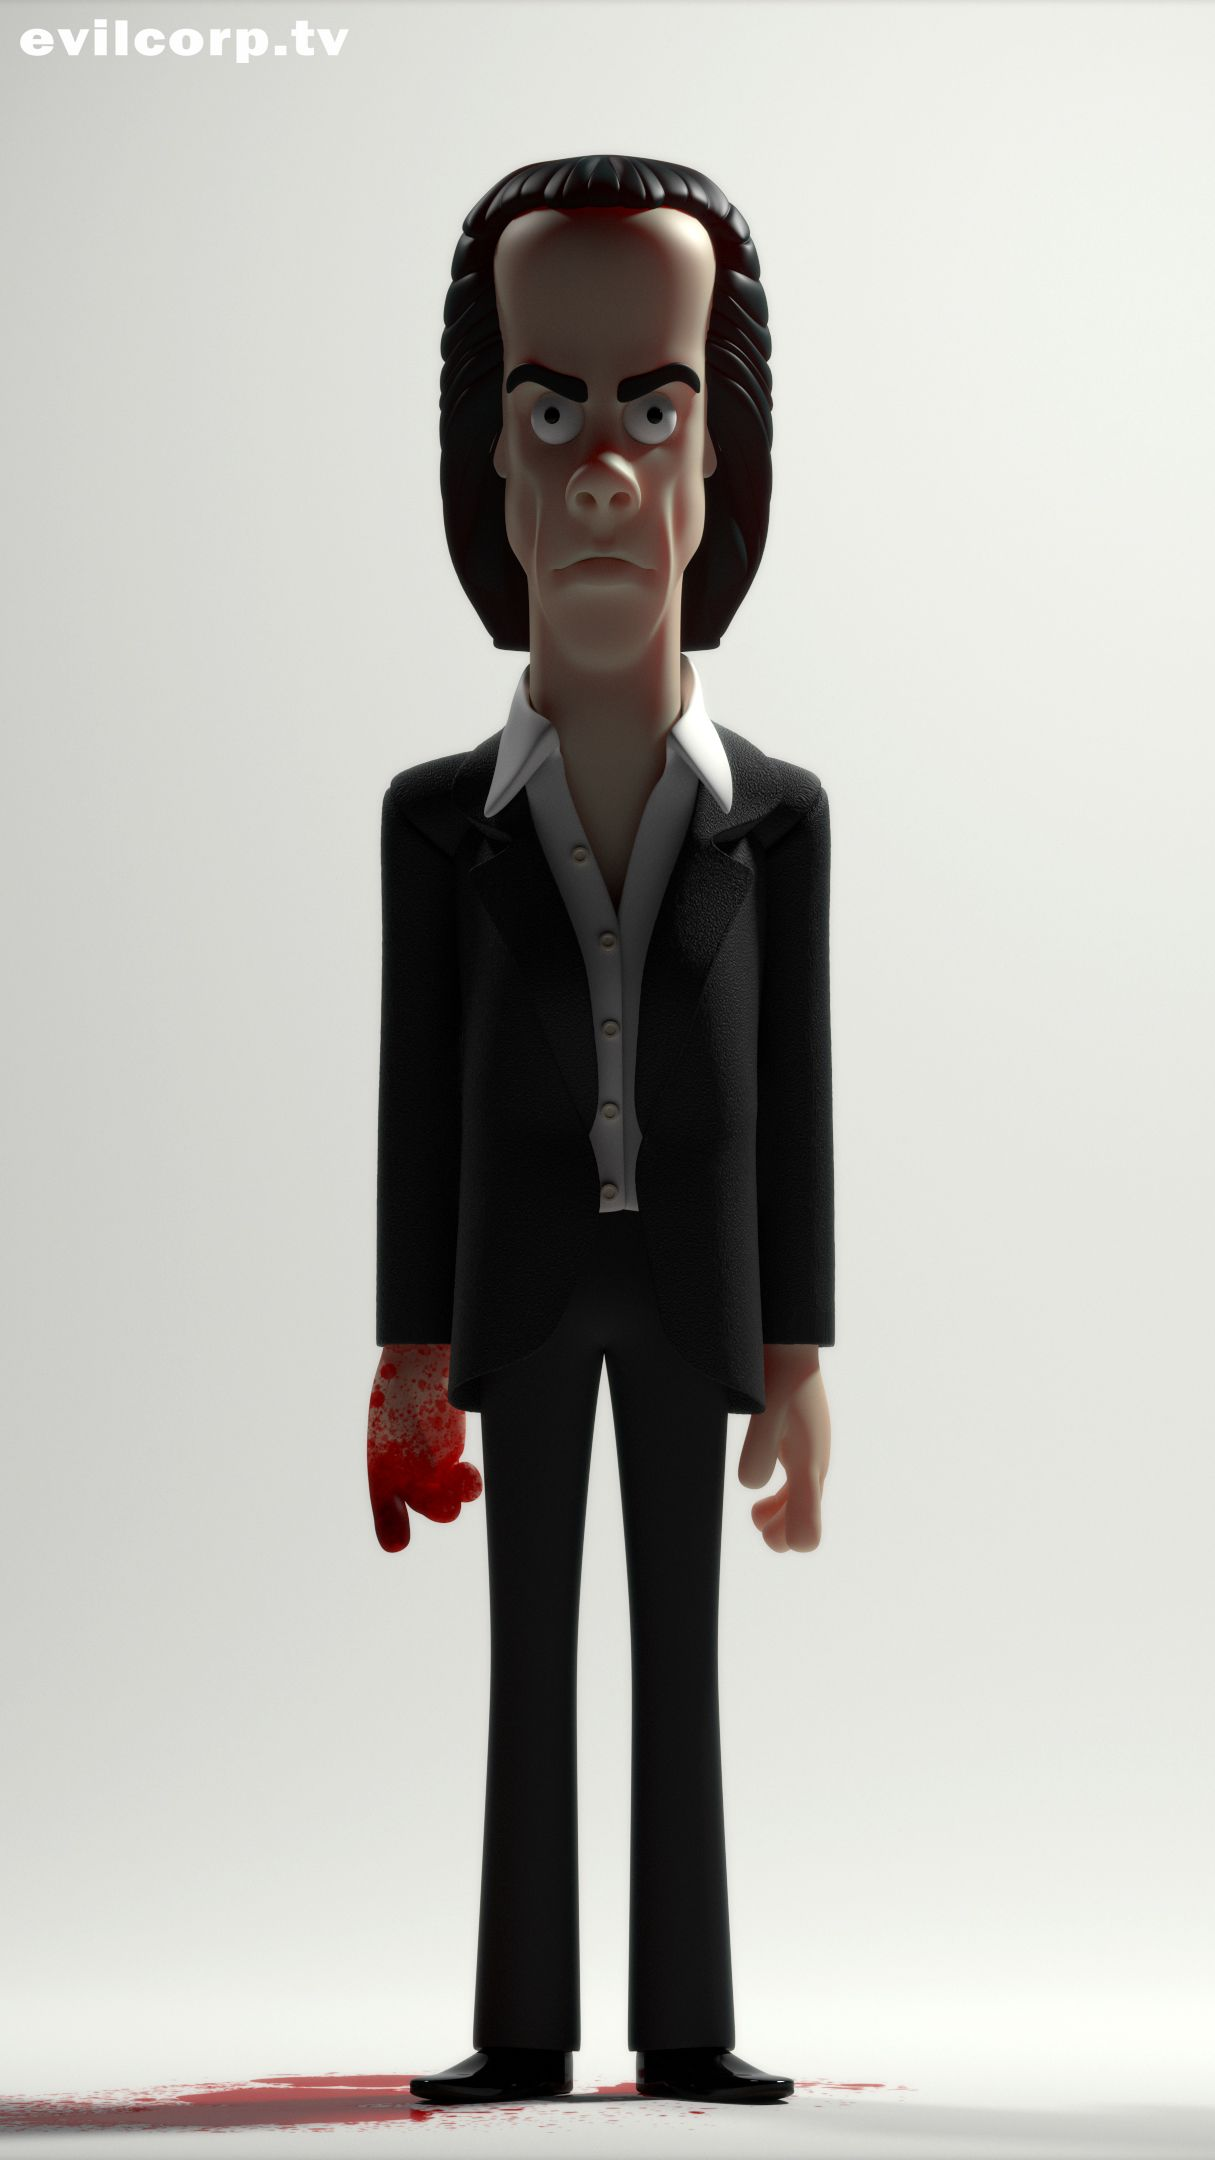 evil corporation toys - Google Search | Vinyl Life Forms | Pinterest ...